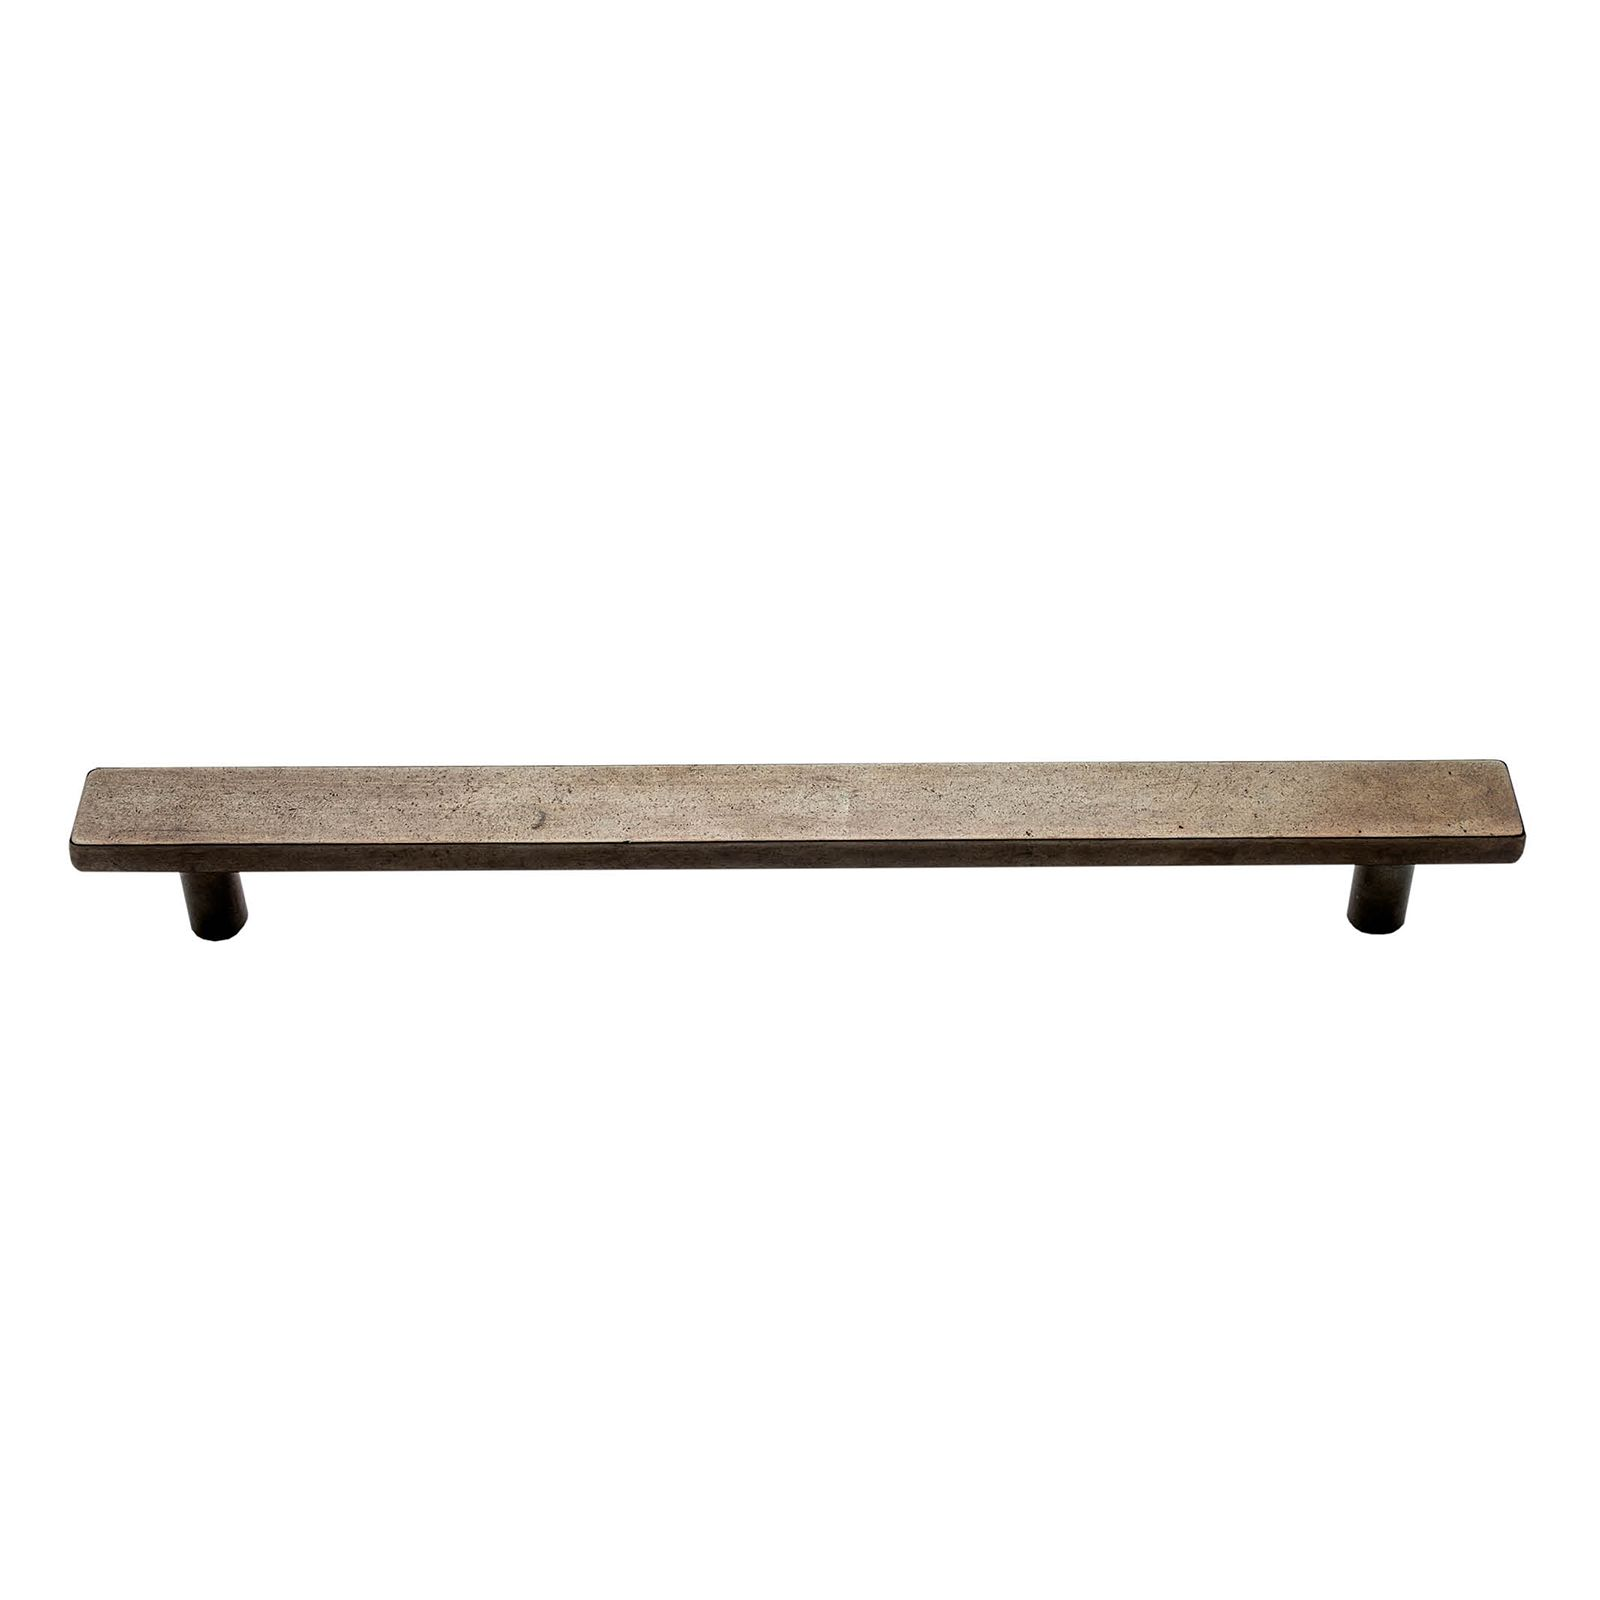 "Edge Bar Cabinet Pull 12"" CK135"